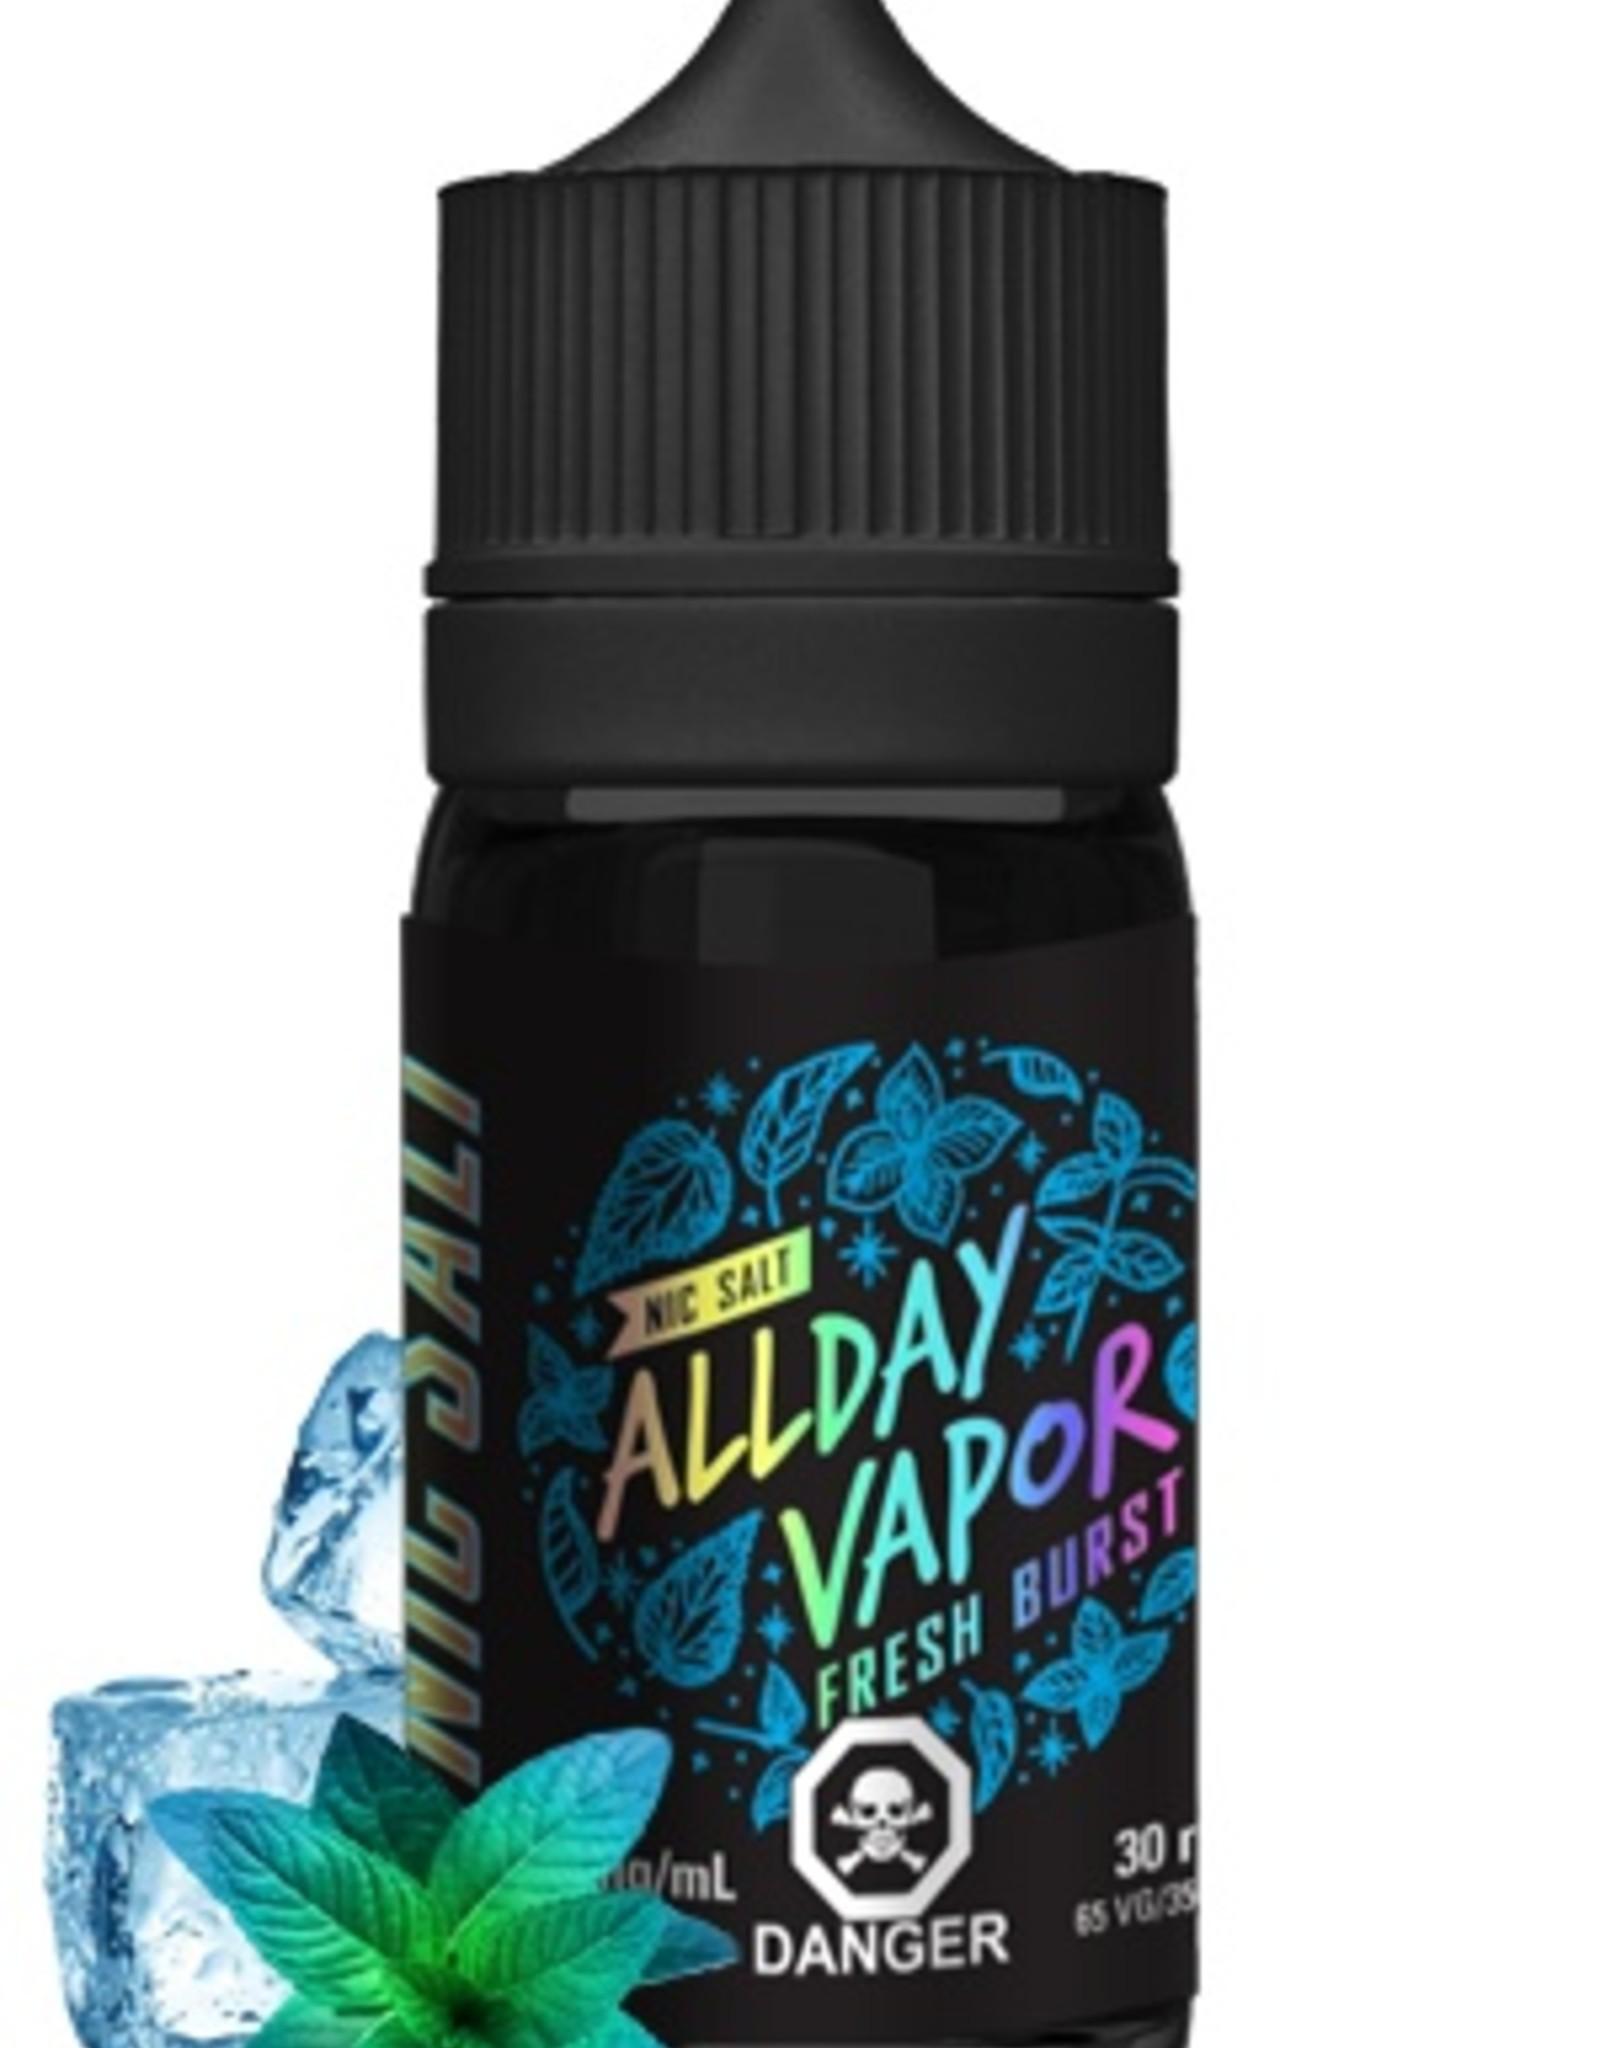 ALL DAY VAPOR Nic Salt ALLDAY VAPOR Fresh Burst (30mL)